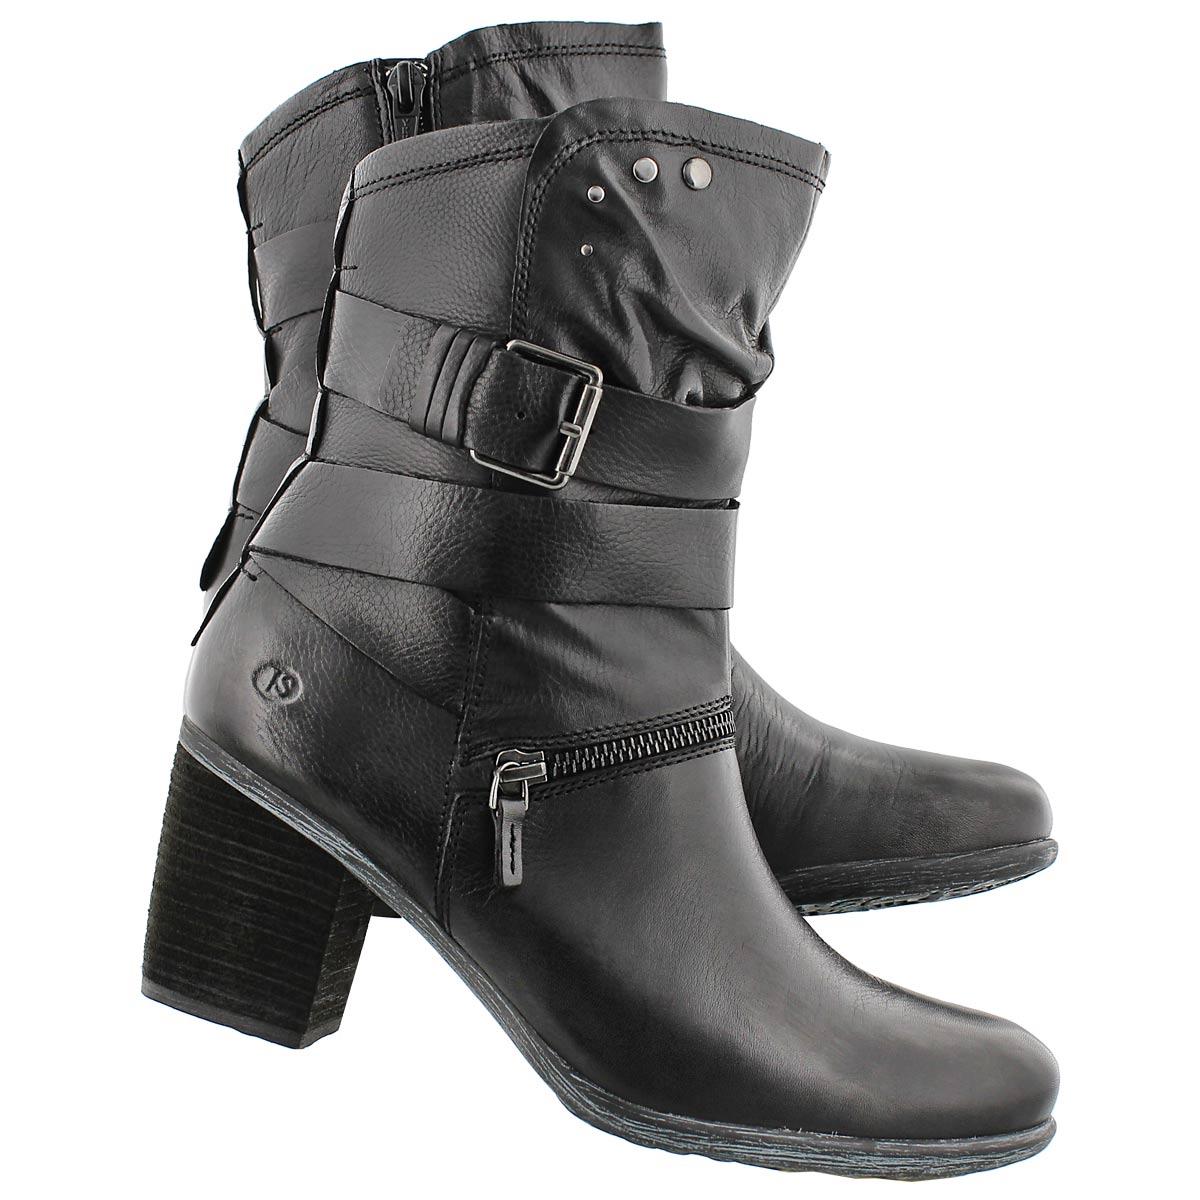 Lds Britney 06 black lthr mid-calf boot